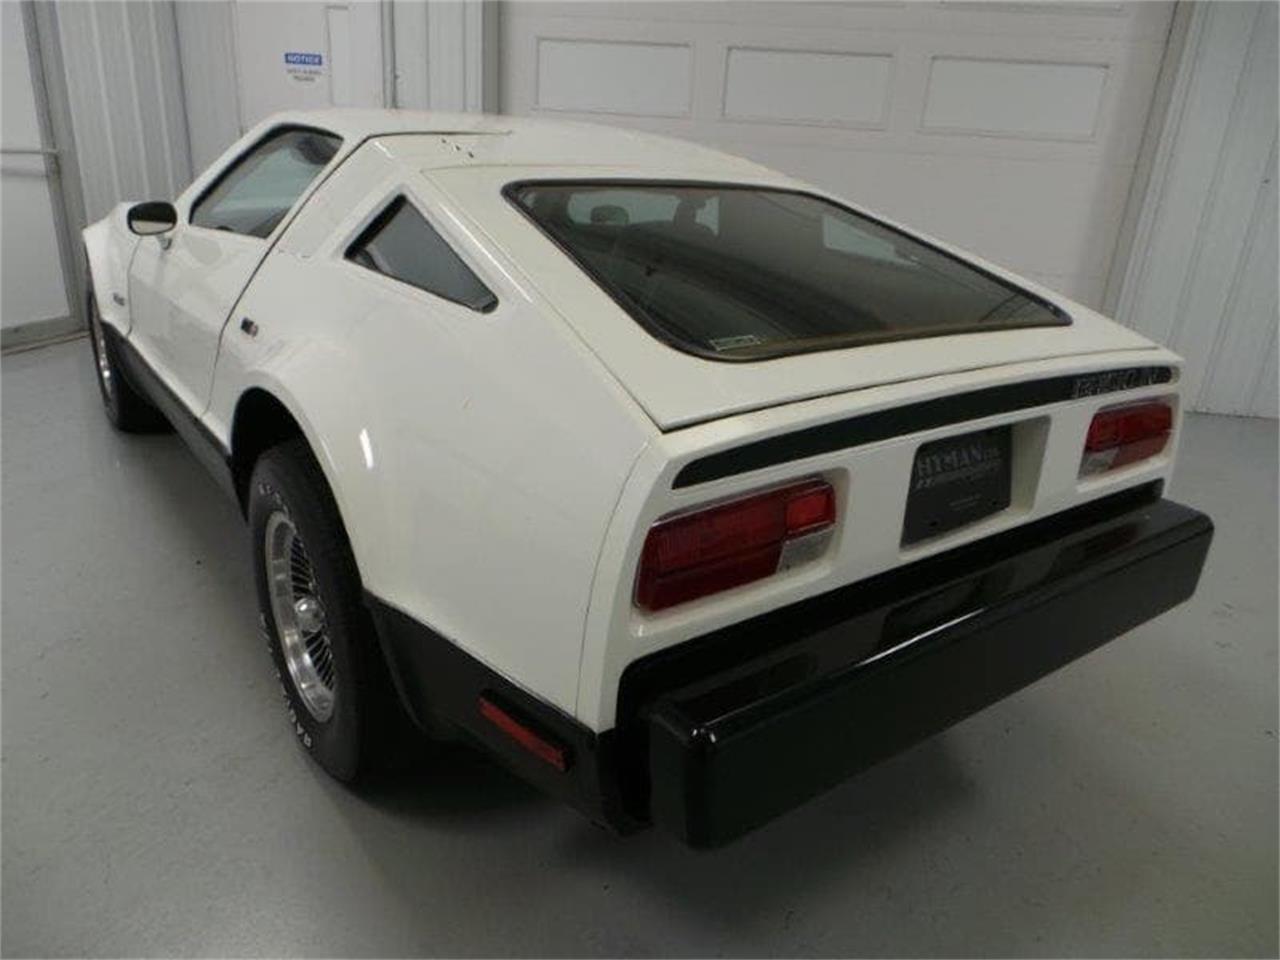 Large Picture of 1975 Bricklin SV 1 - $26,700.00 - JLA1